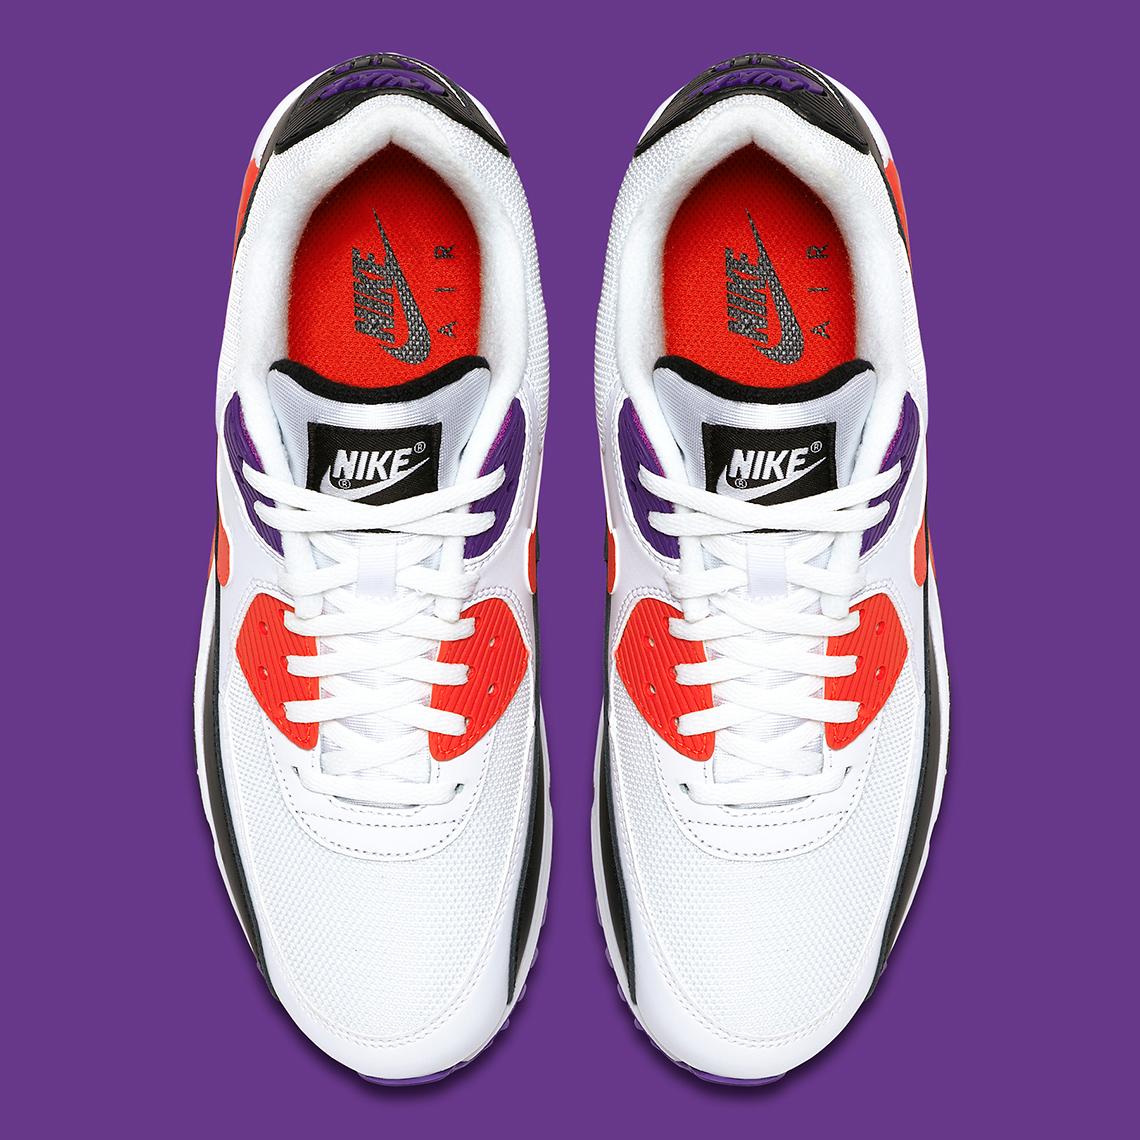 Zapatos NIKE Air Max 90 Essential AJ1285 106 WhiteRed